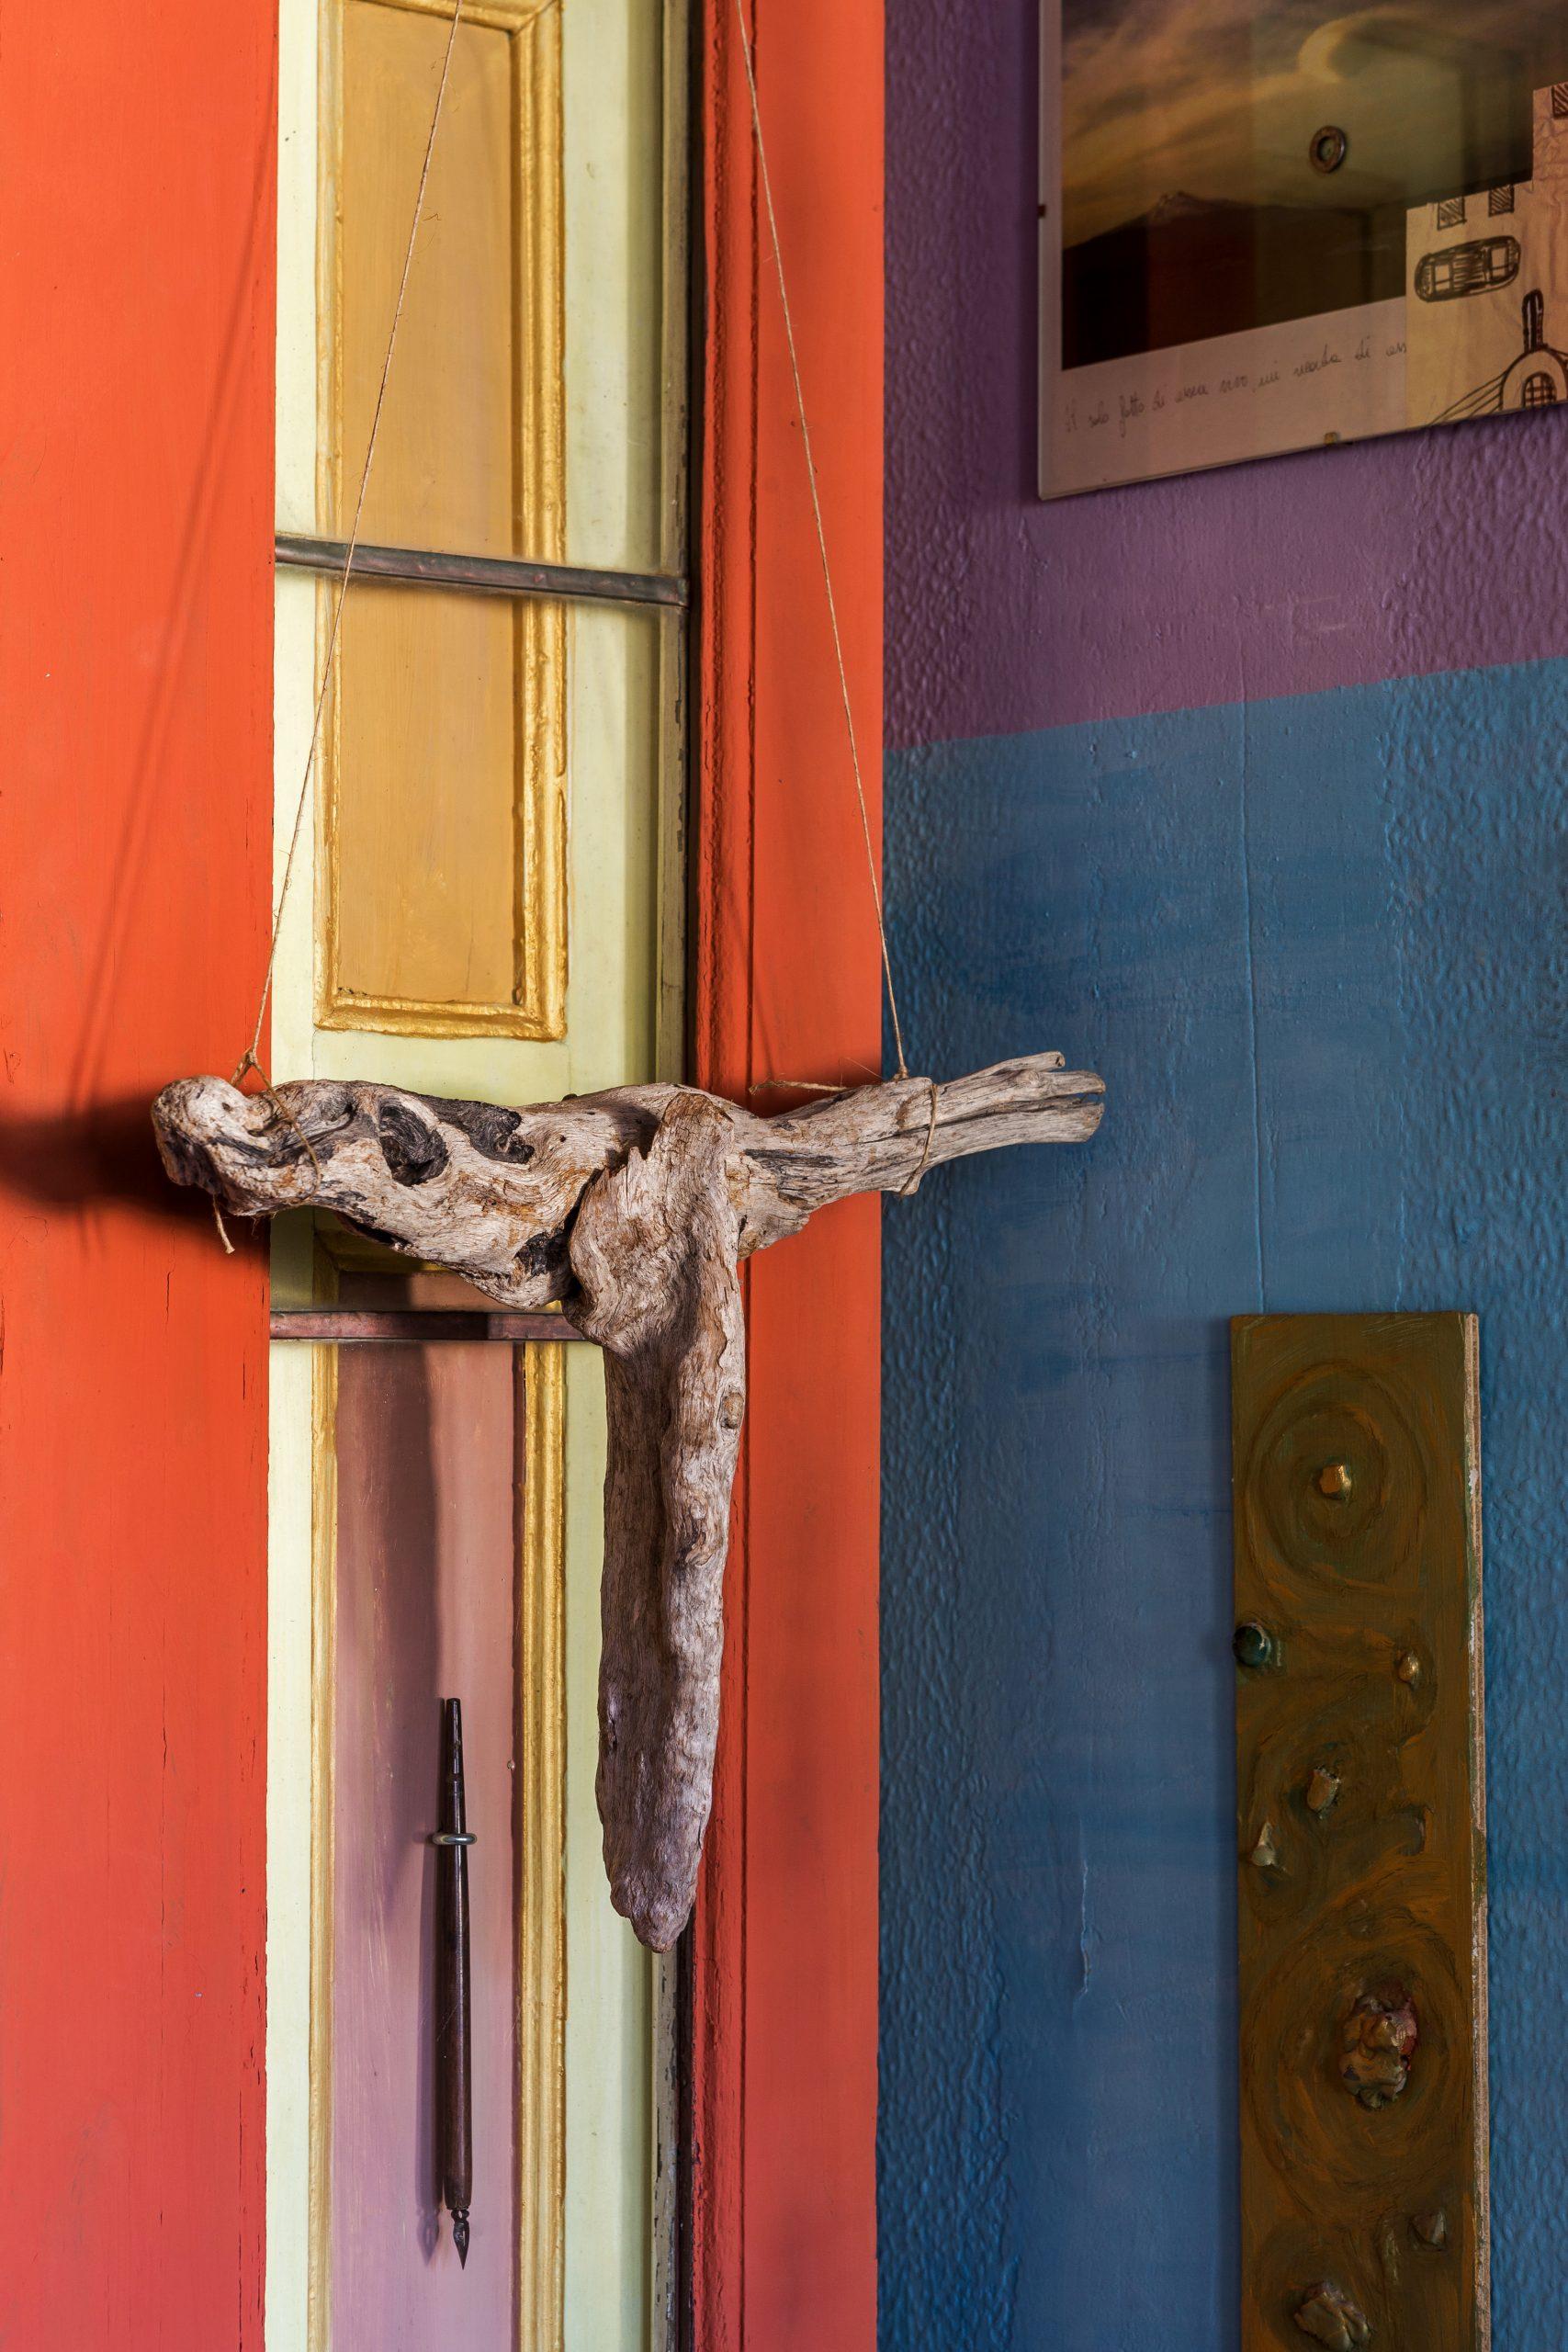 sosiale huis kontemporêre kunstenaar